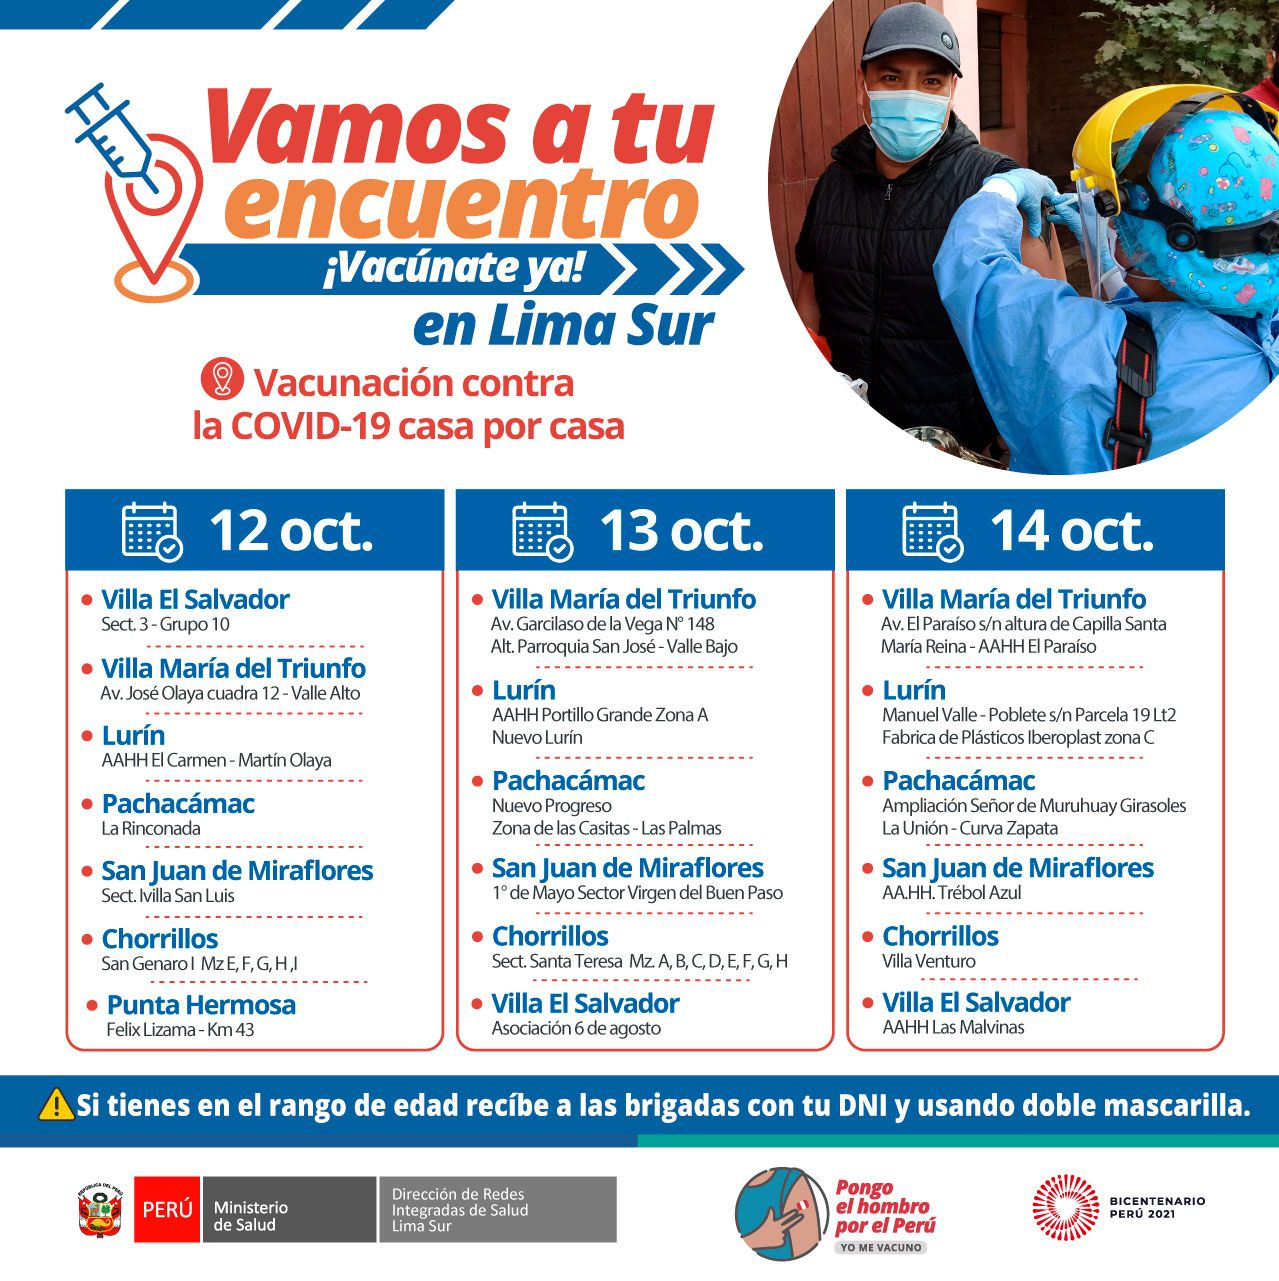 ¡La vacuna contra la COVID-19 llega a tu HOGAR!. Foto: Diris Lima Sur